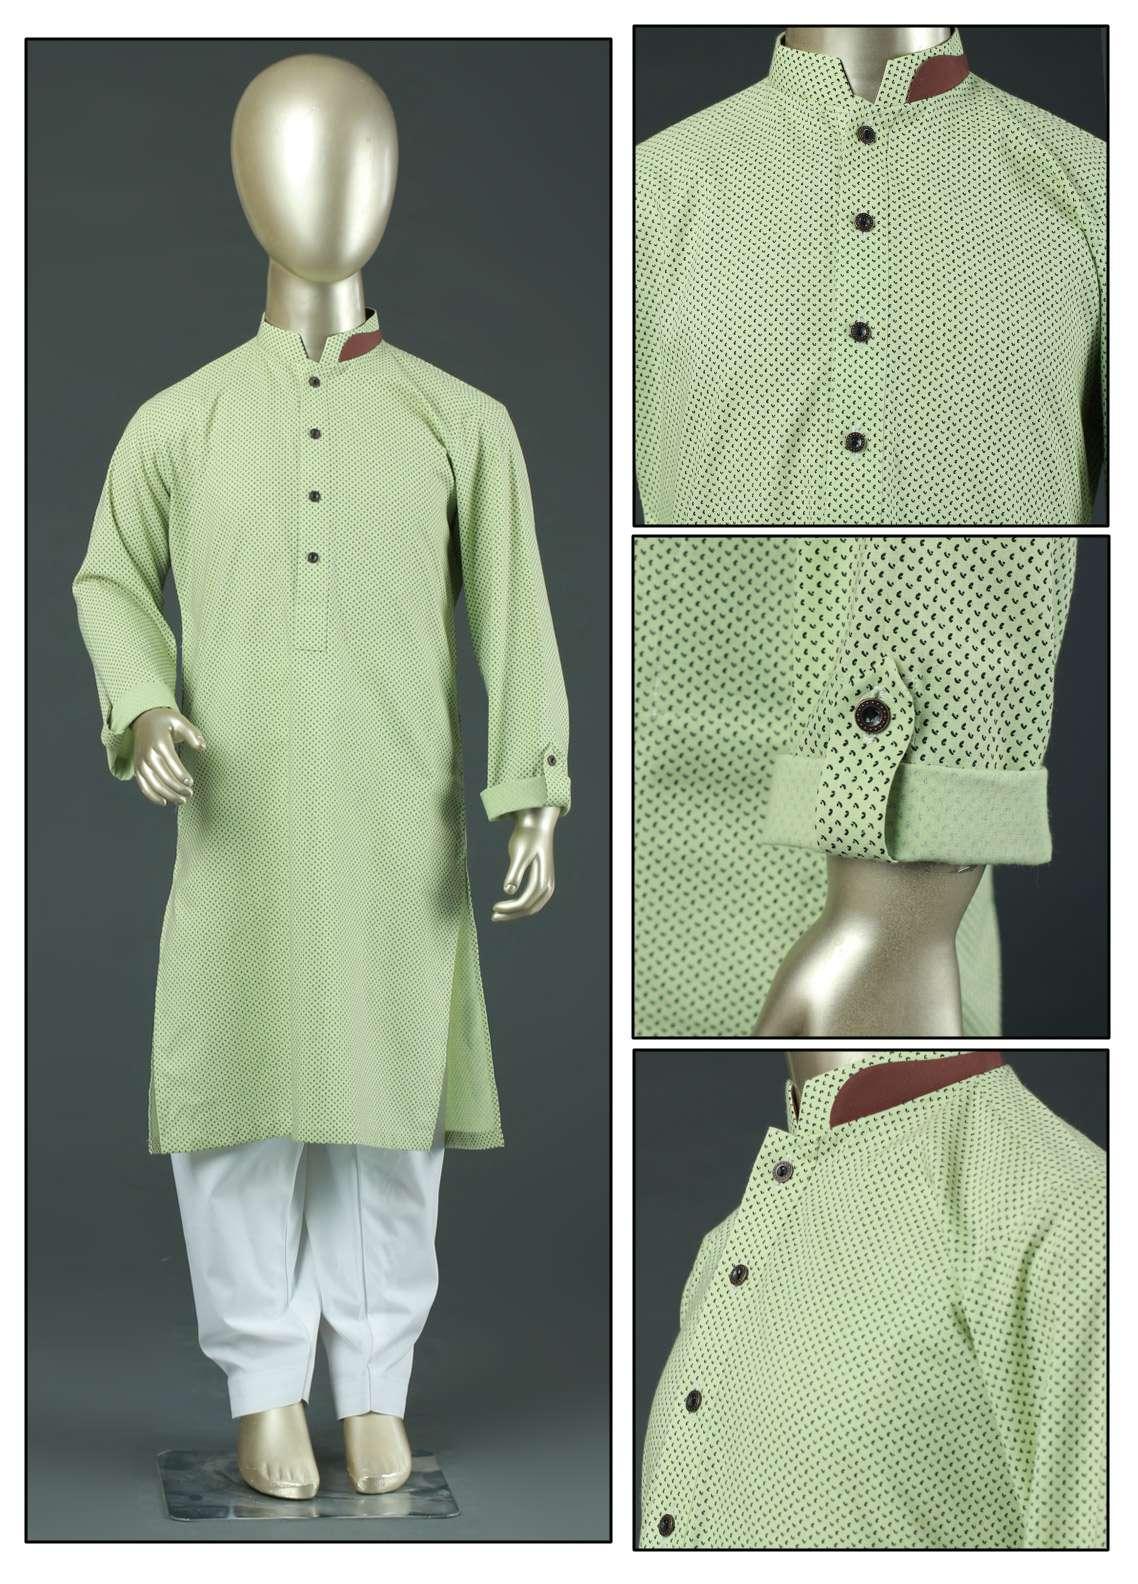 Aizaz Zafar Cotton Formal Kurtas for Boys -  AZ19B 220 Lemon